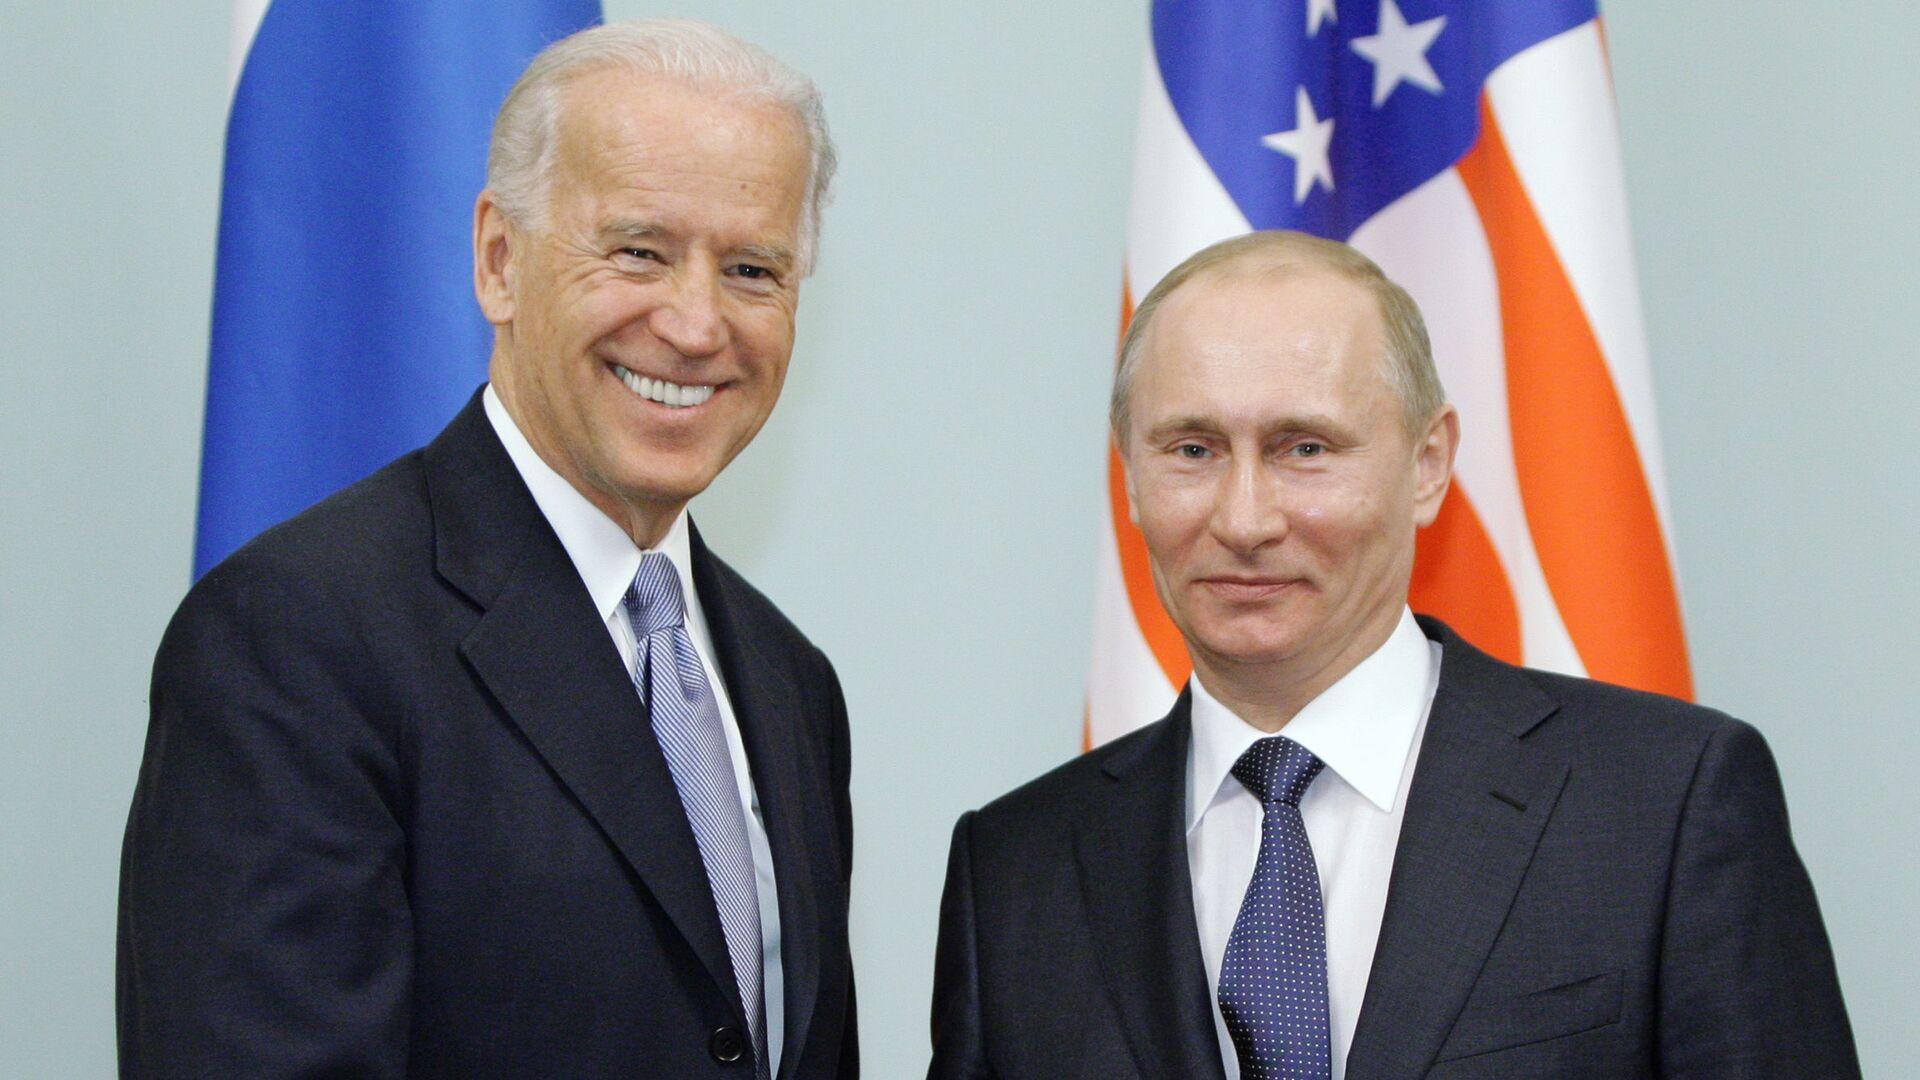 Vladimir Putin a Joe Biden v roce 2011 - Sputnik Česká republika, 1920, 06.05.2021